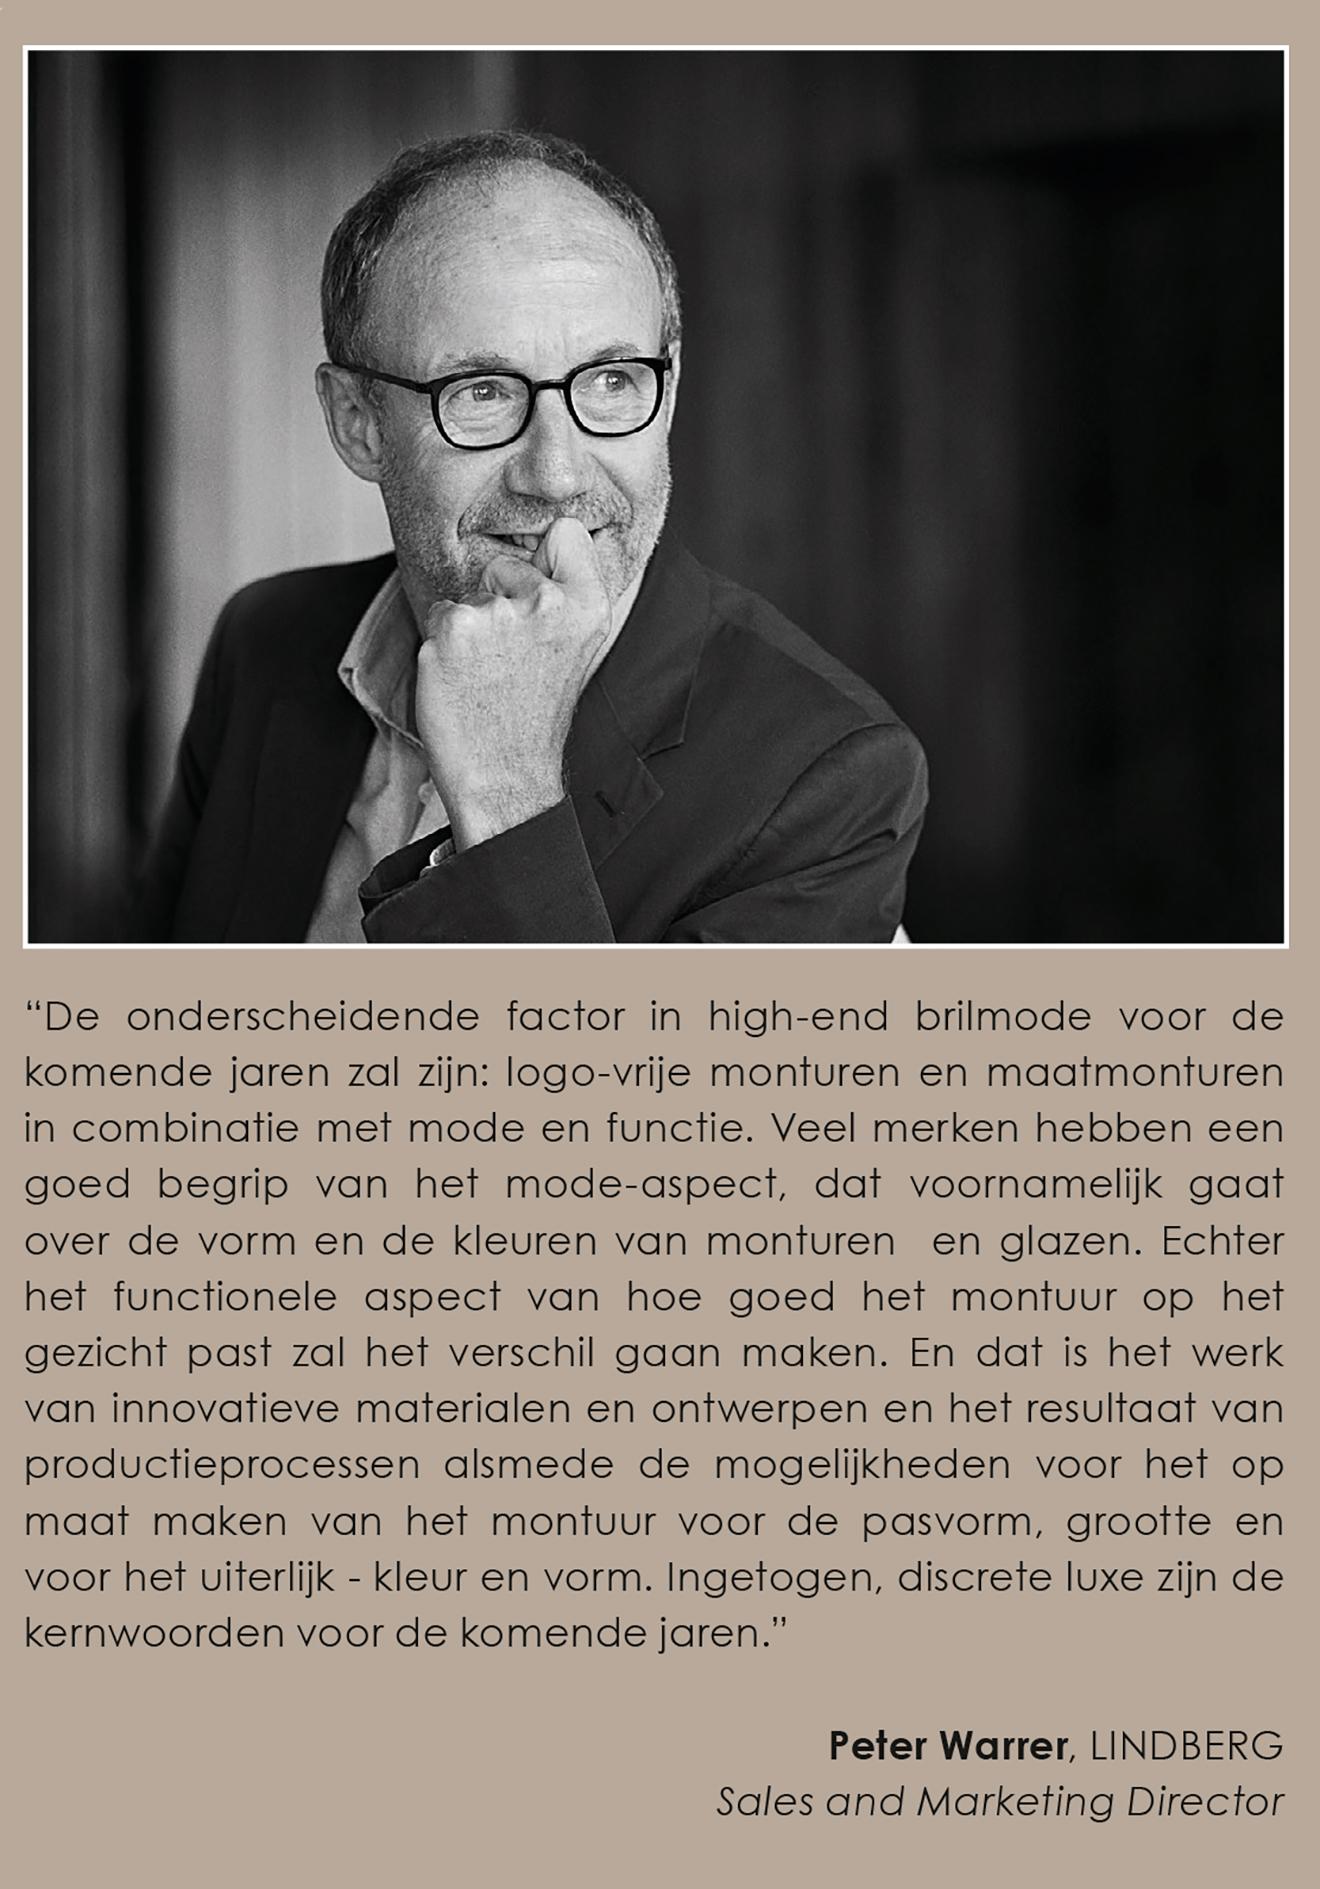 Dutch Stijl & Allure Magazine goes behind the Spirit of LINDBERG